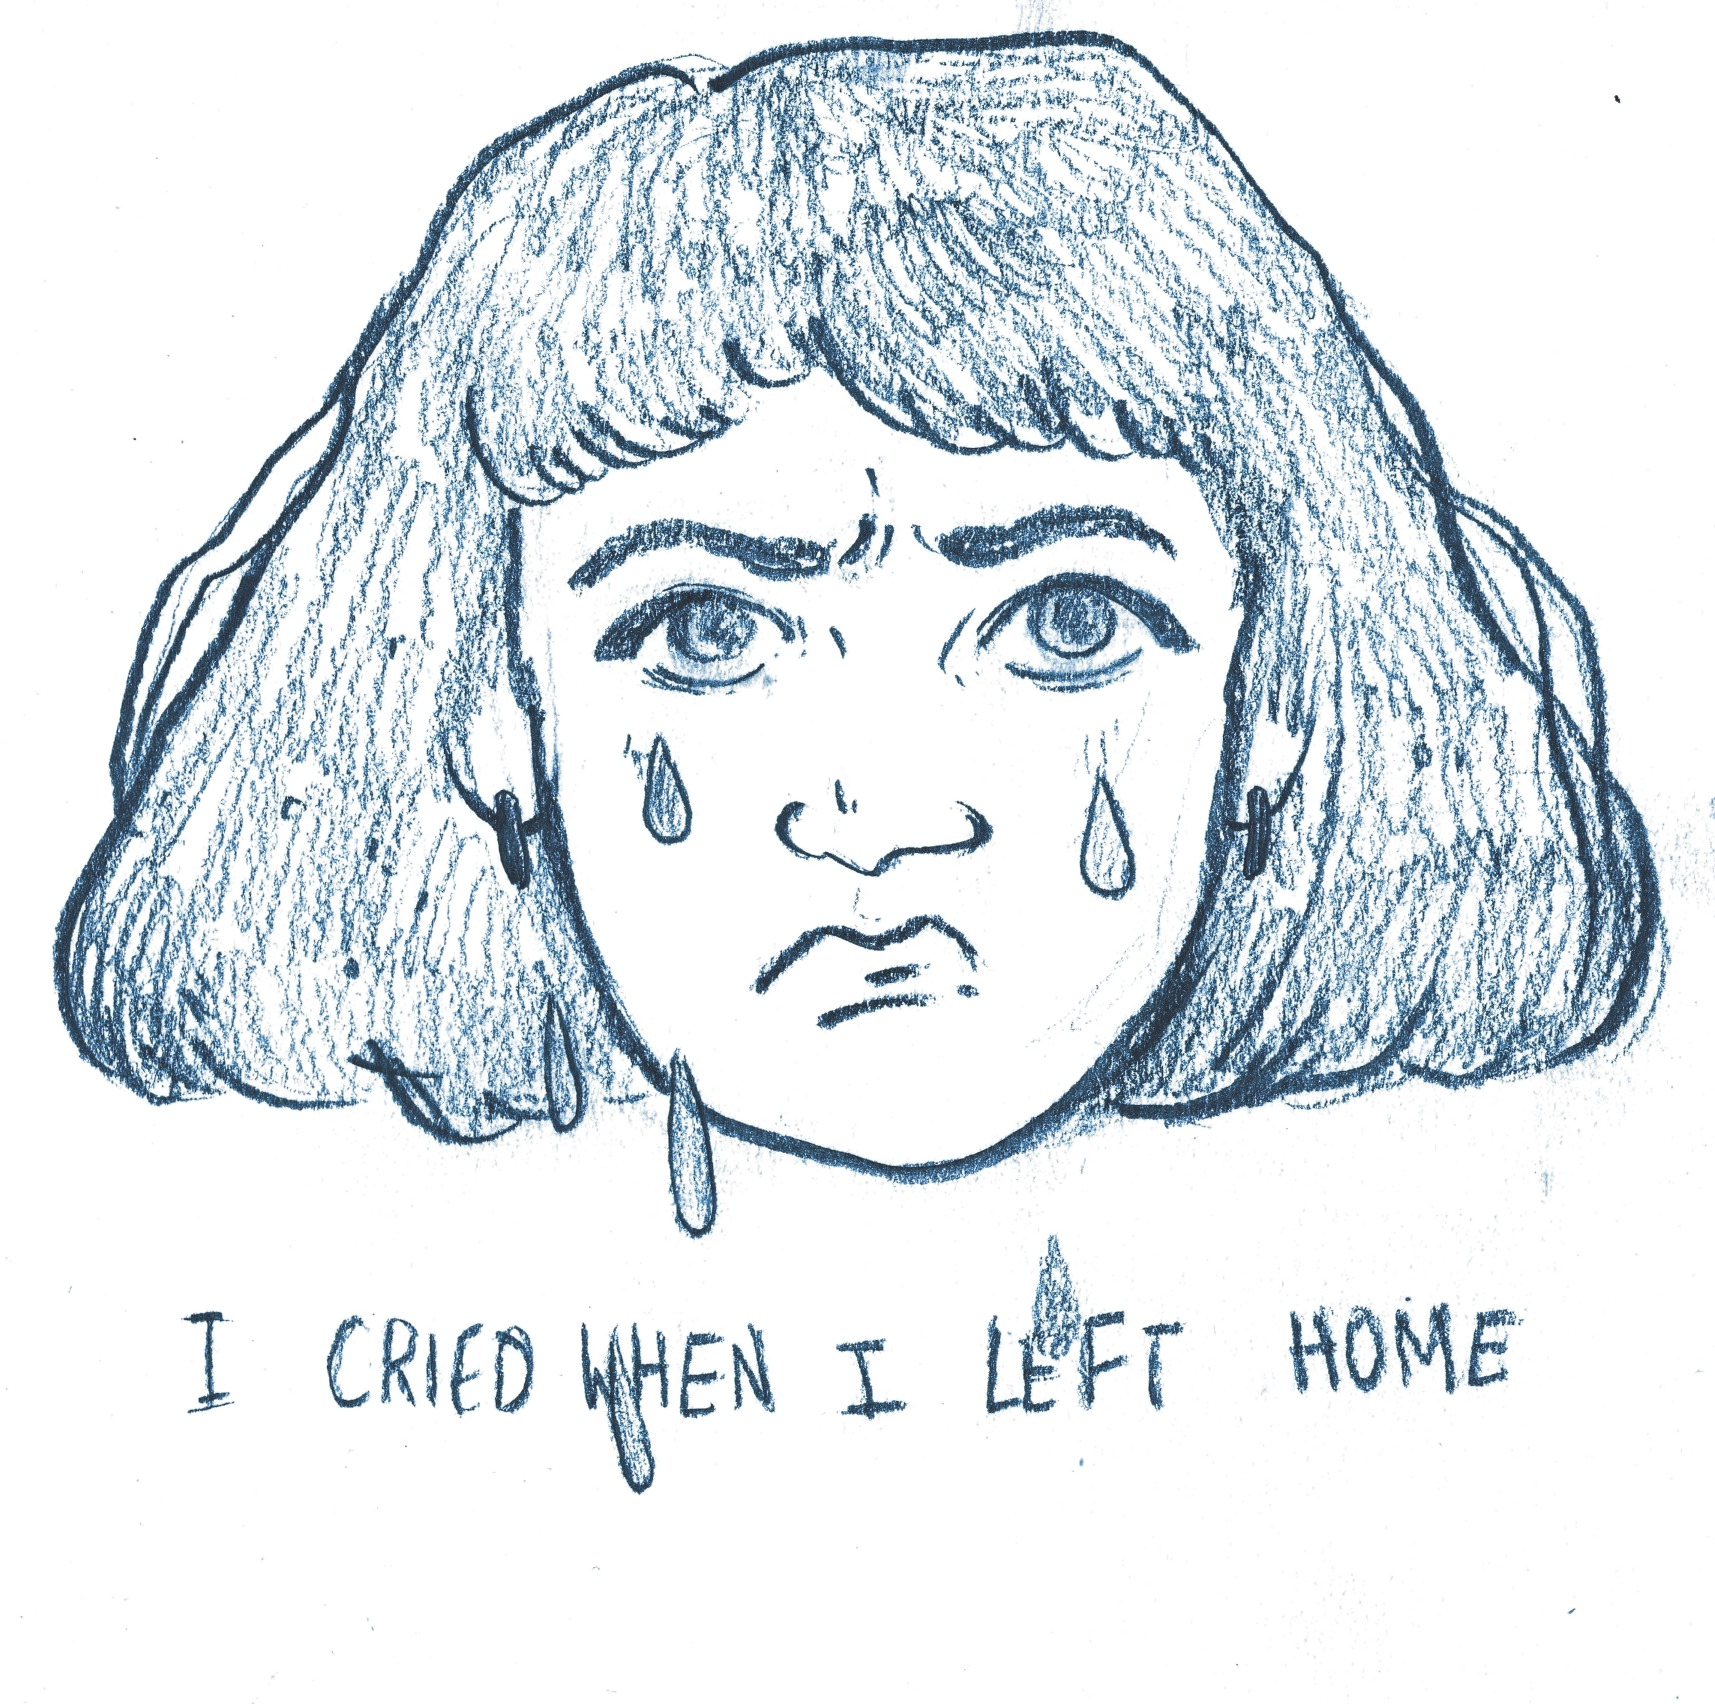 I cried when I left home